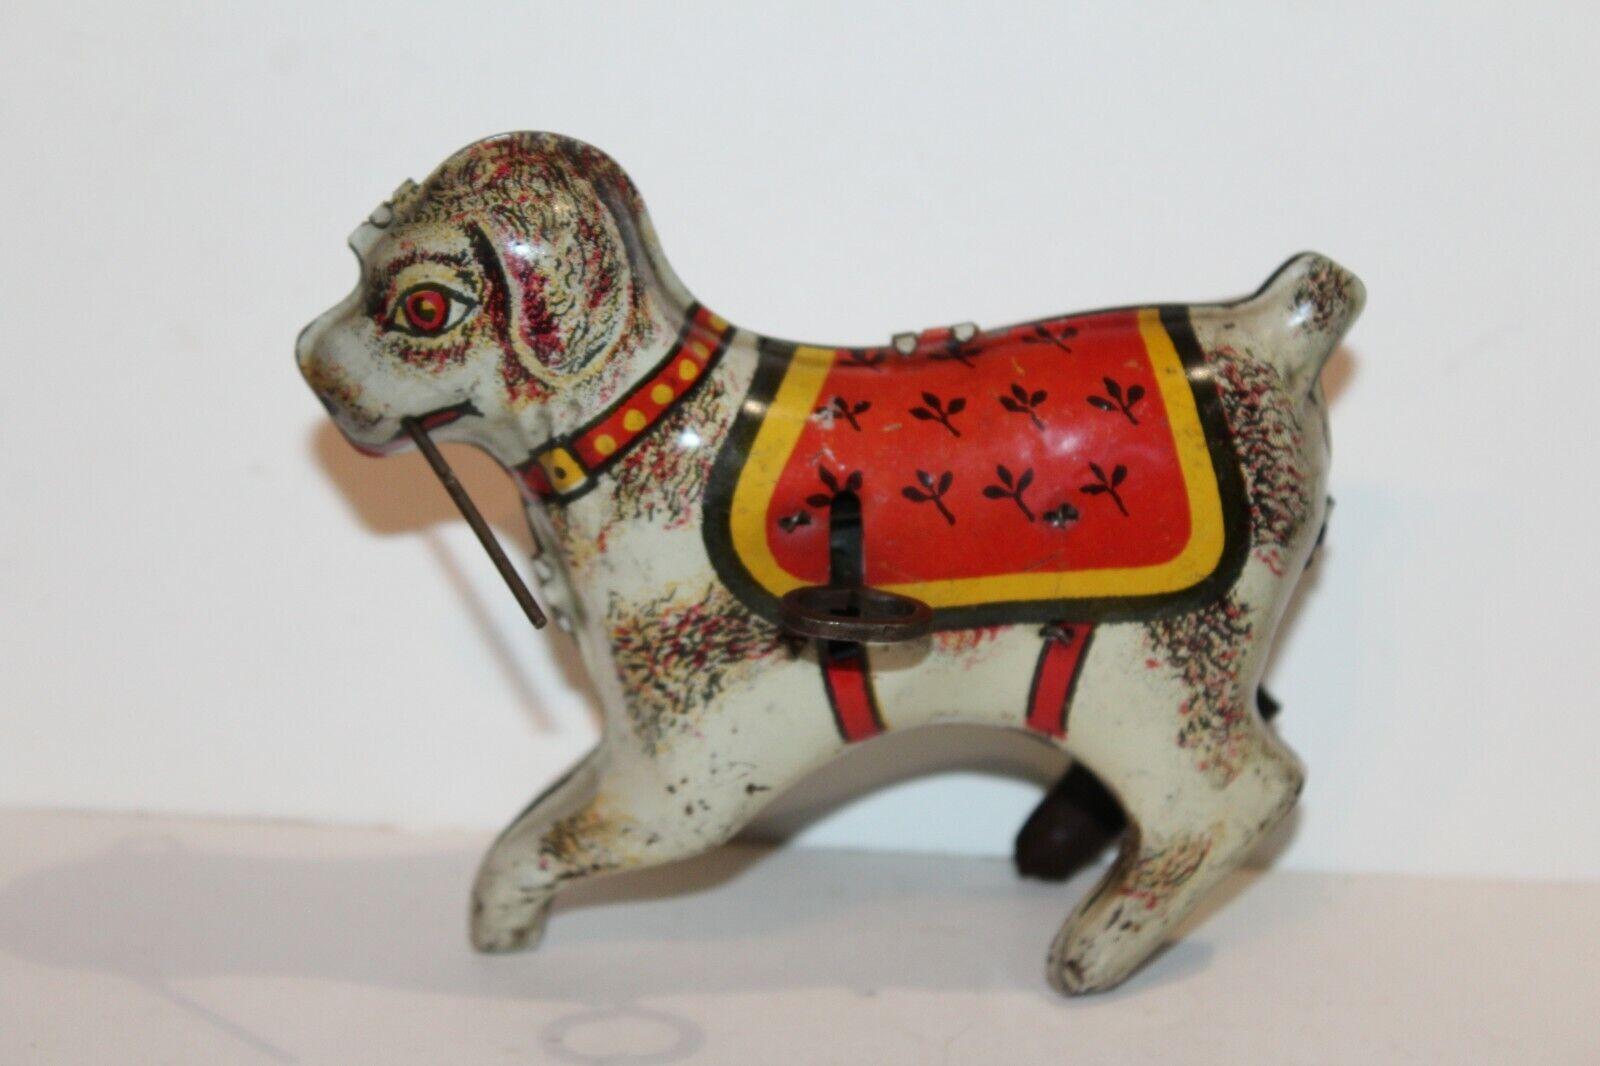 VERY NICE VINTAGE TIN LITHO WIND UP CIRCUS DOG